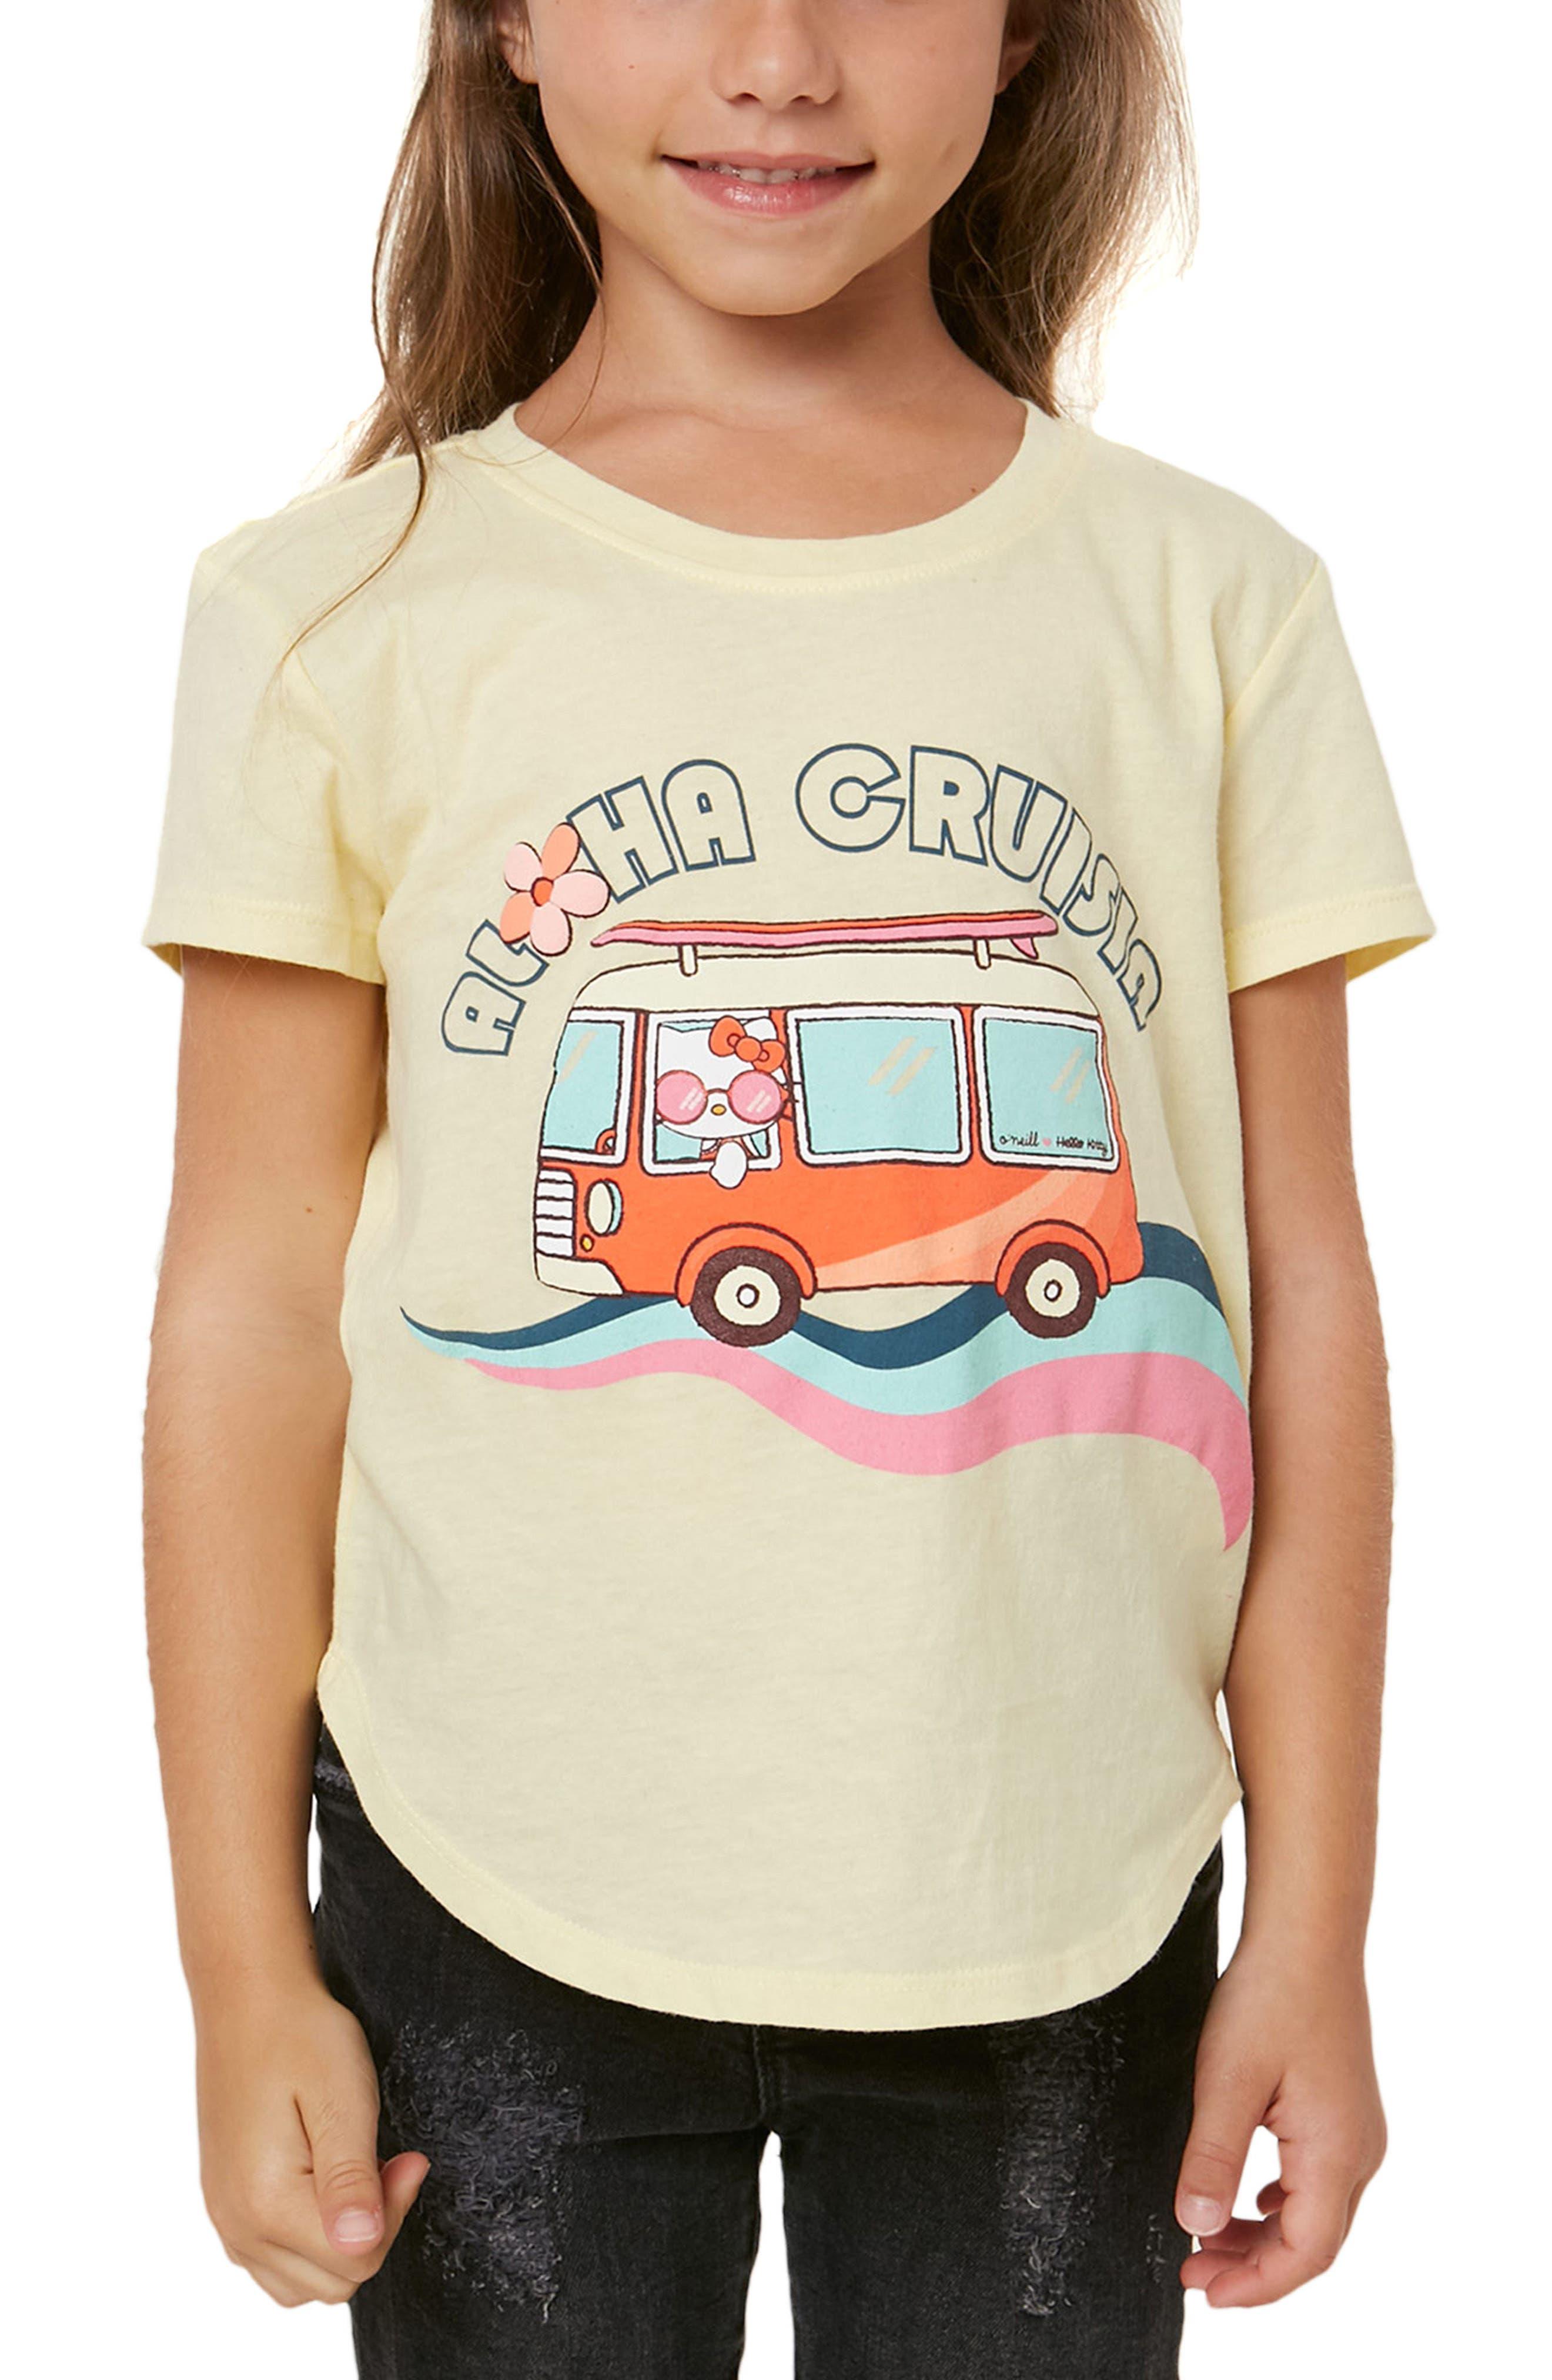 O'Neill x Hello Kitty® Aloha Cruisin Graphic Tee (Toddler Girls & Little